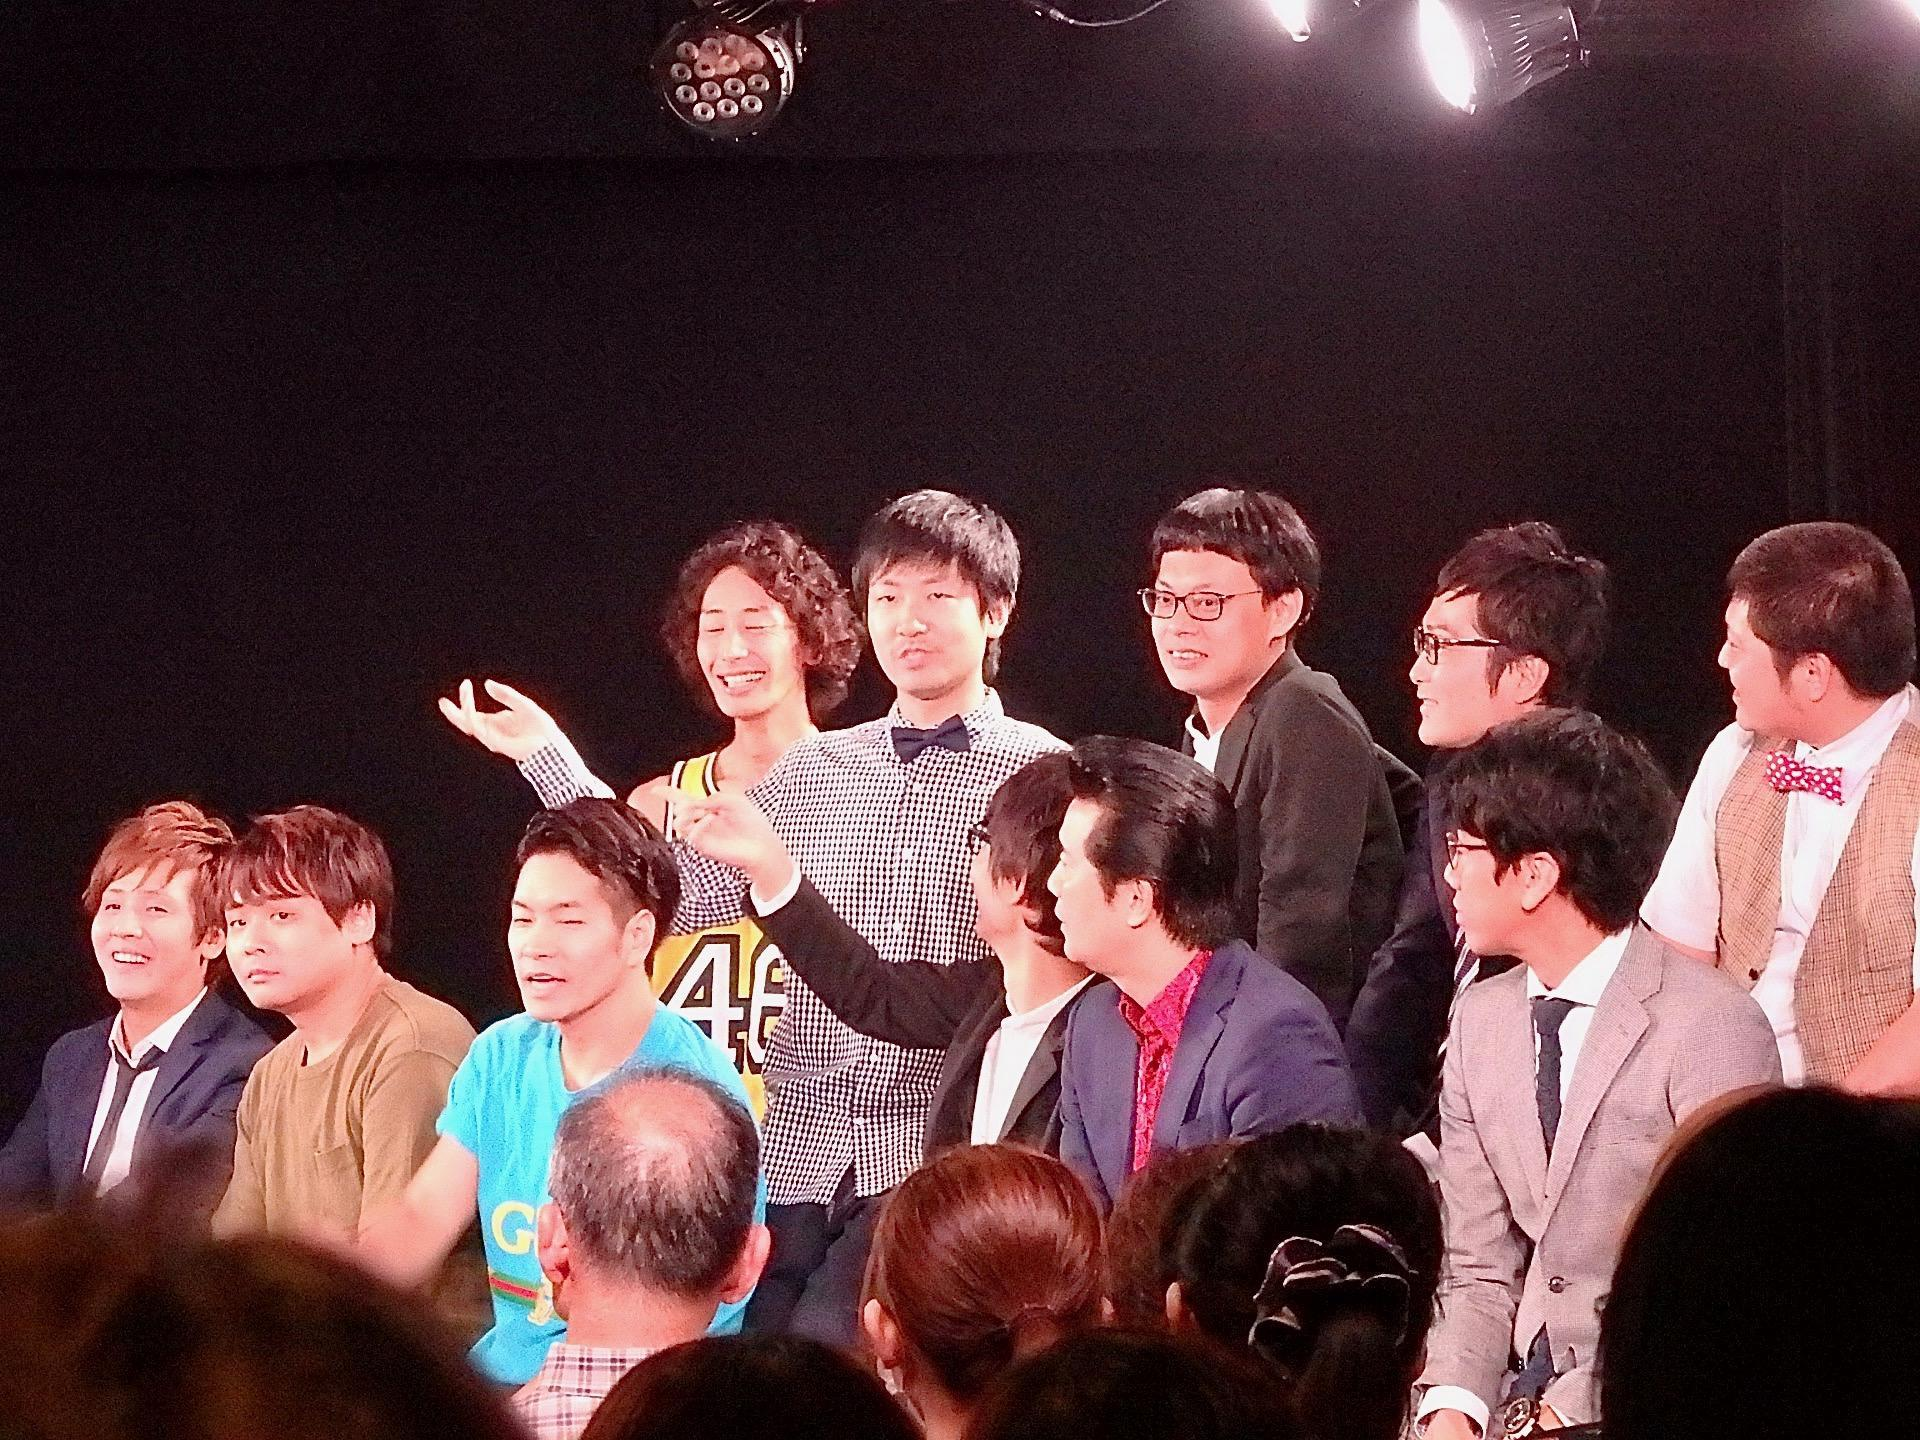 http://news.yoshimoto.co.jp/20171016142918-de938d00caaf3f860c9c28481a2e57f51c456db0.jpg